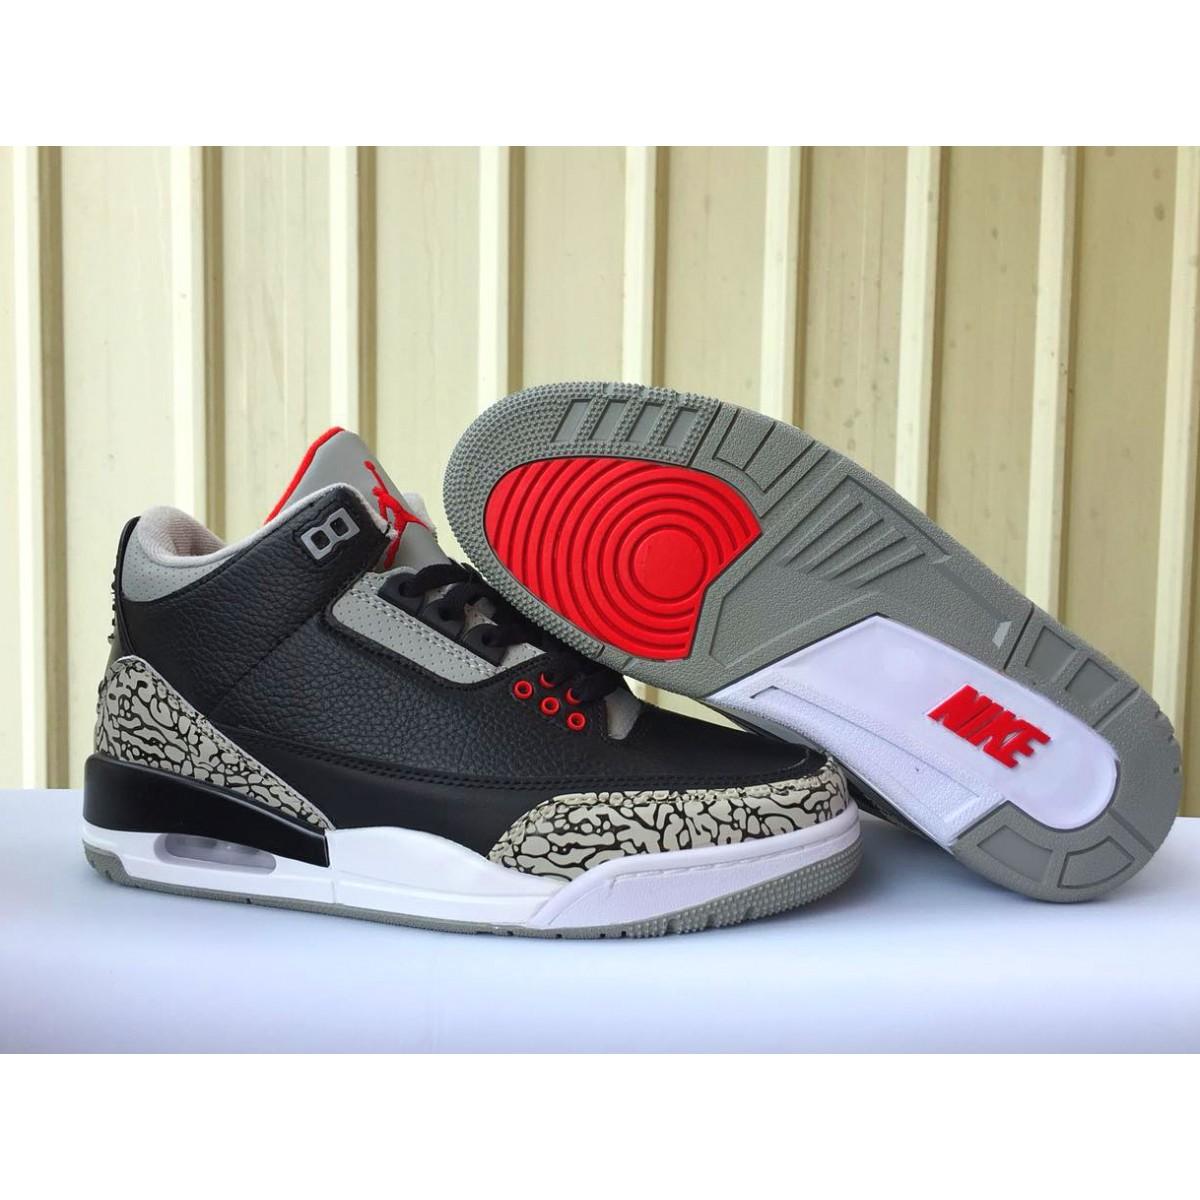 new product 390cf 1c943 Air Jordan 3 Retro OG Black Cement Basketball Men Shoes